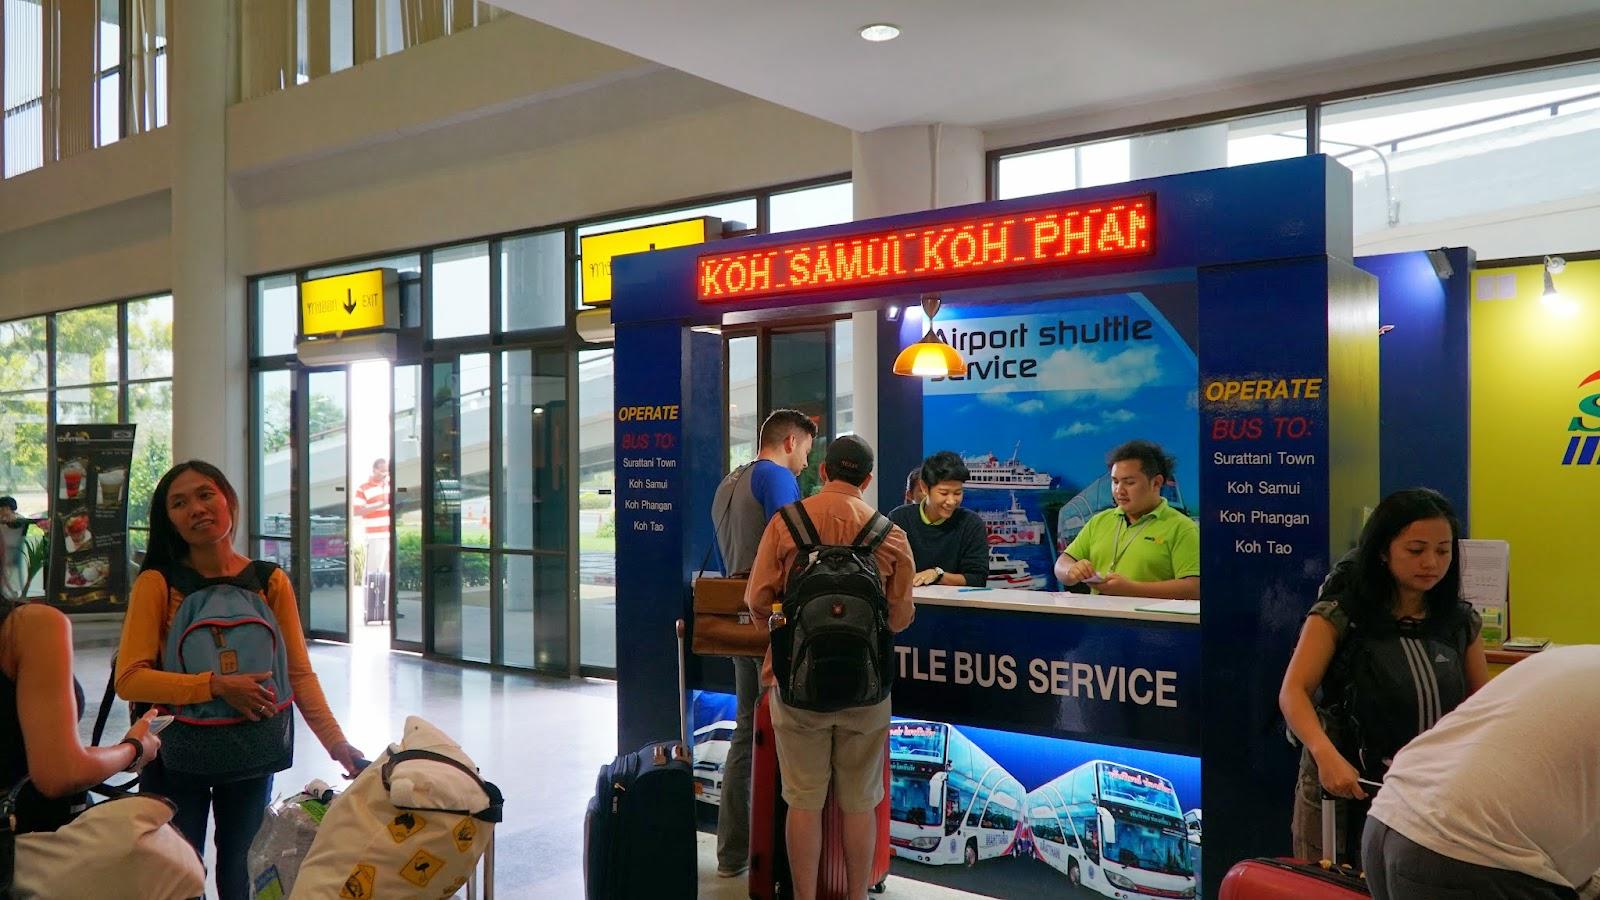 Arriving at Surat Thani international airport